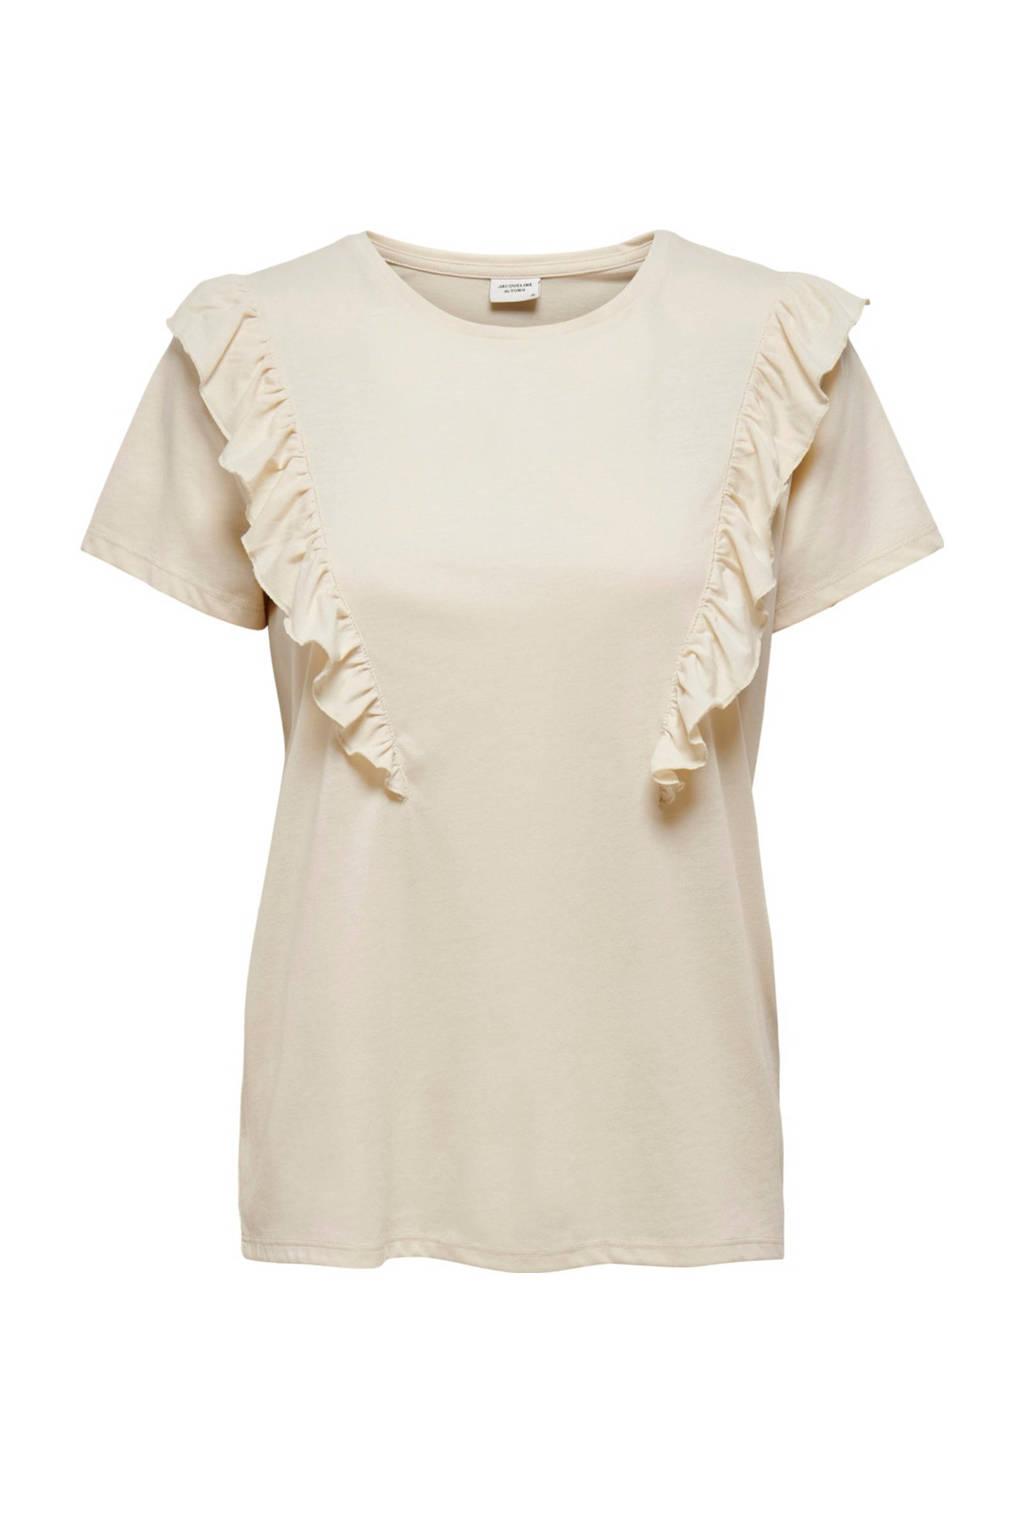 JACQUELINE DE YONG T-shirt met volant ecru, Ecru